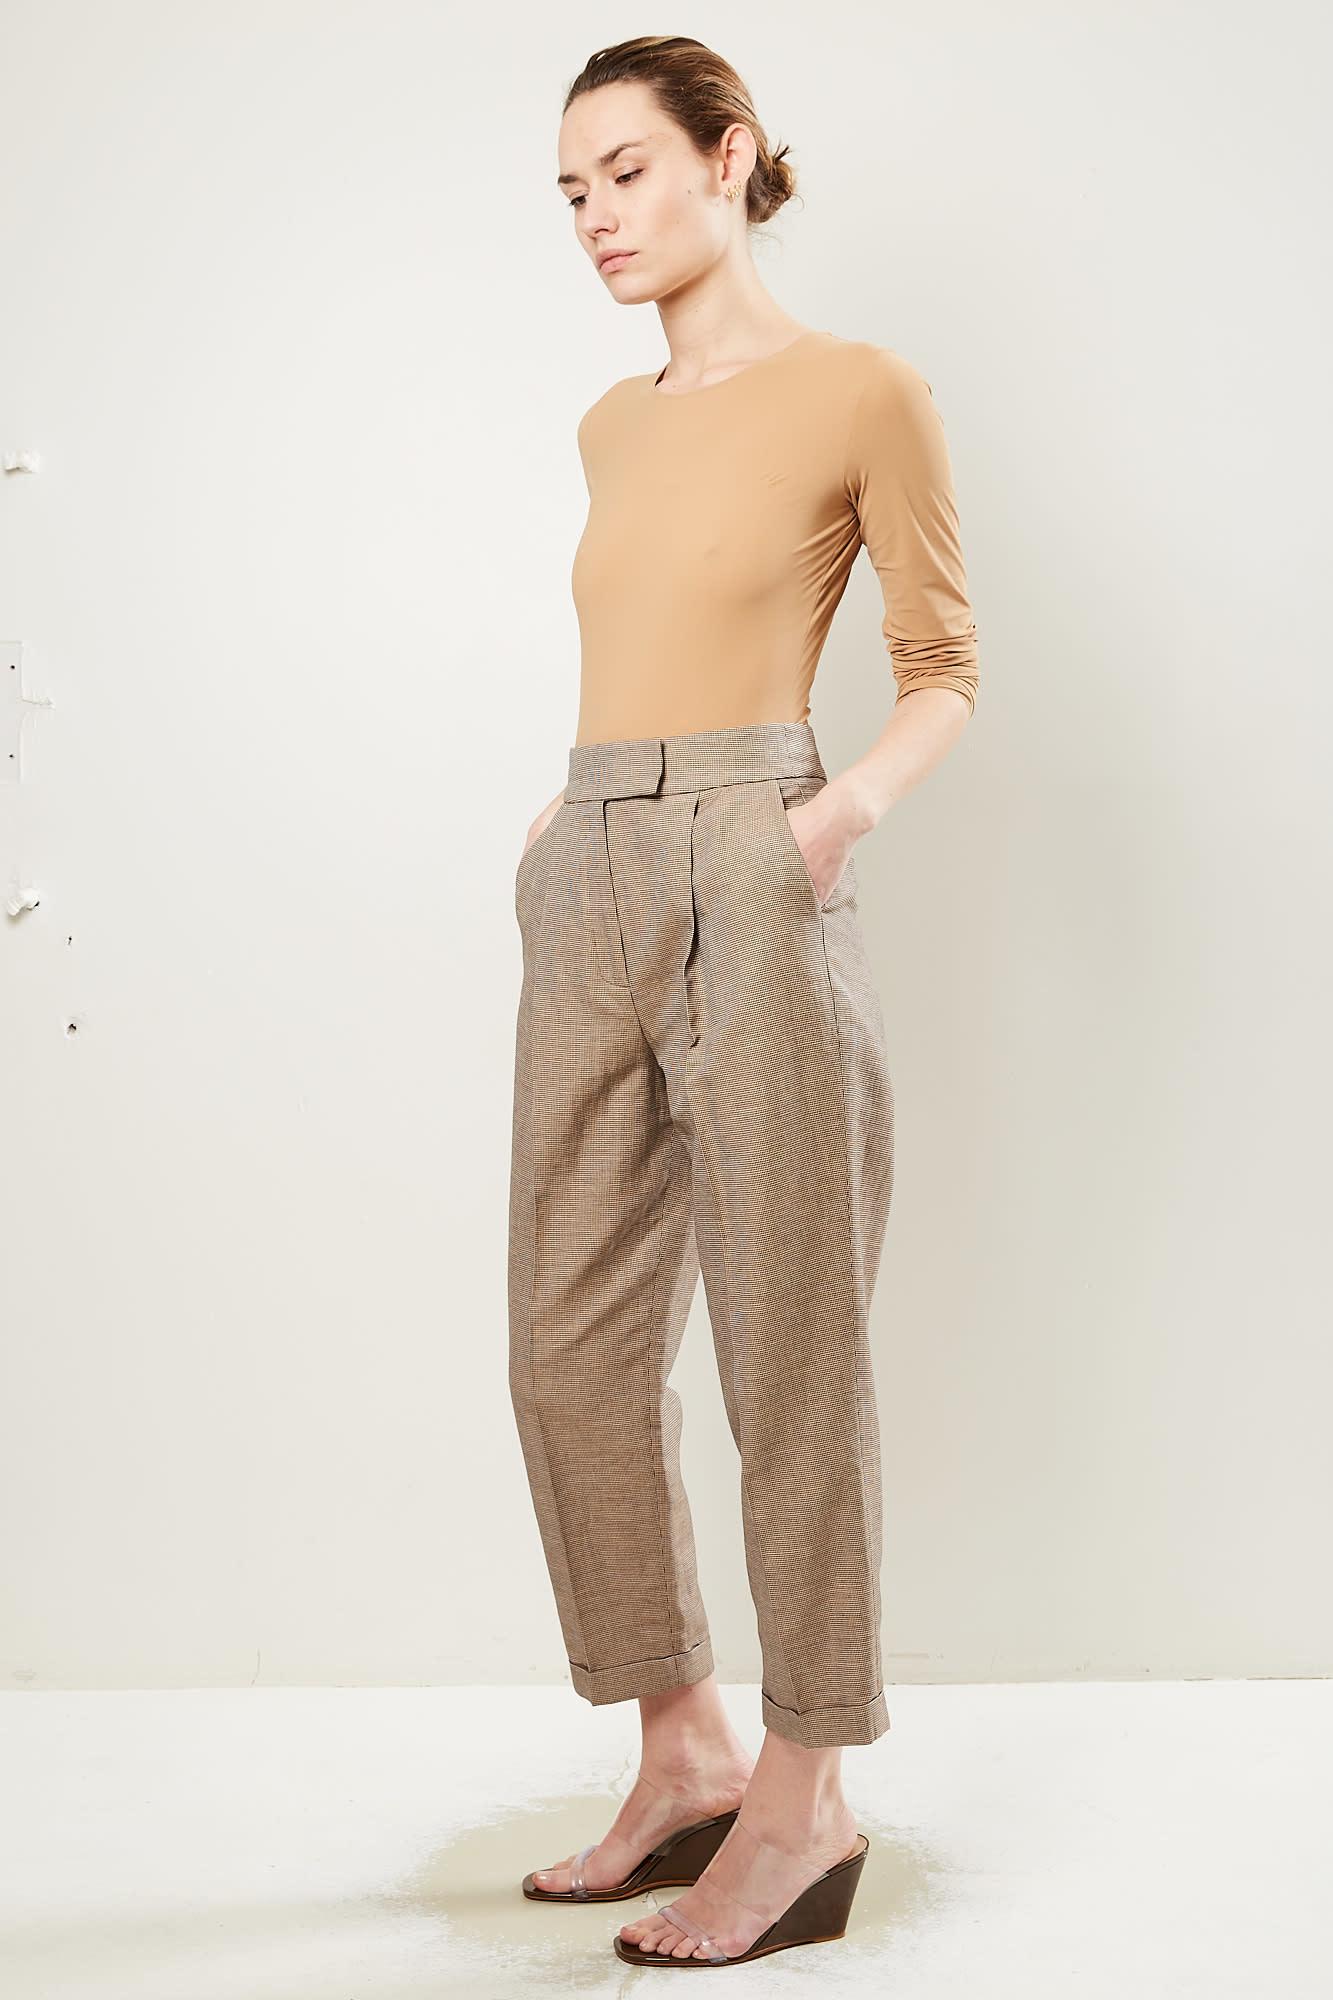 Frenken - Weel check suit trousers